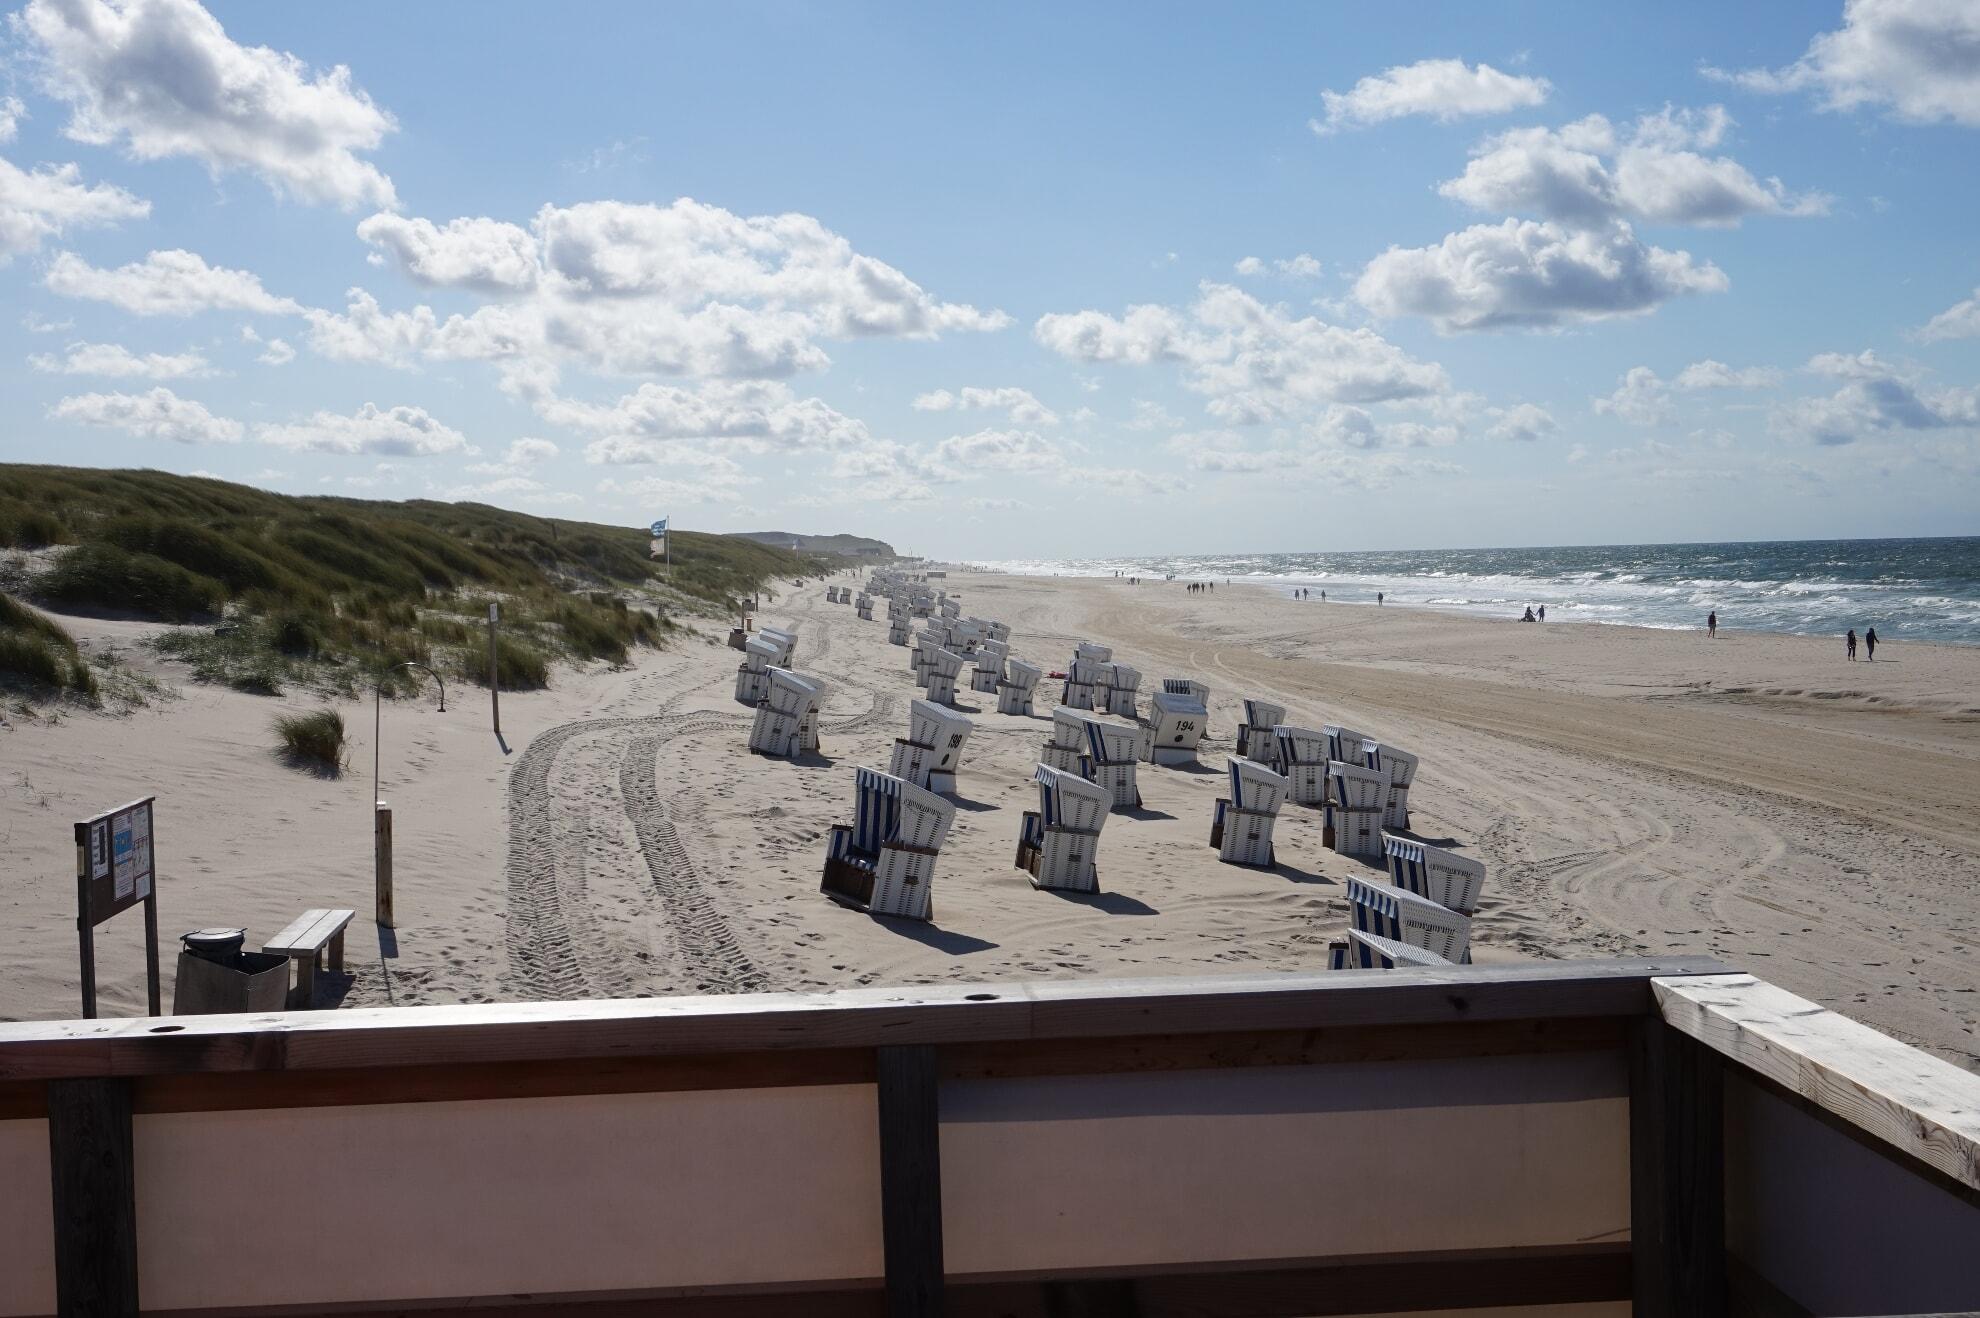 Textil- und FKK-Strand am Dünensteg in Kampen